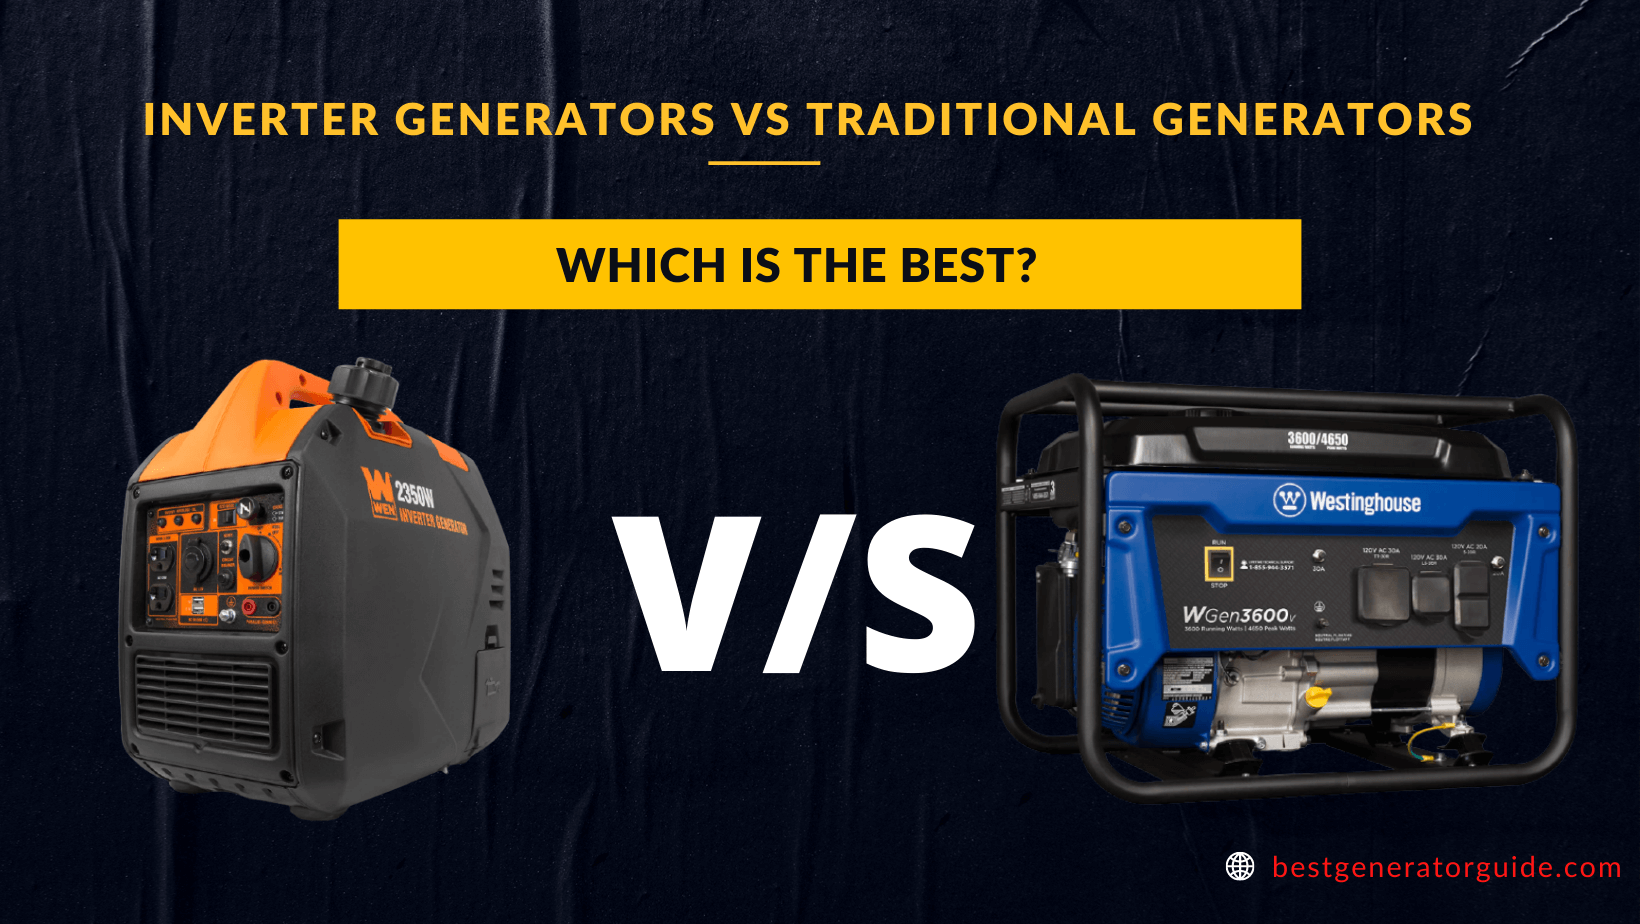 Inverter Generators Vs Traditional Generators